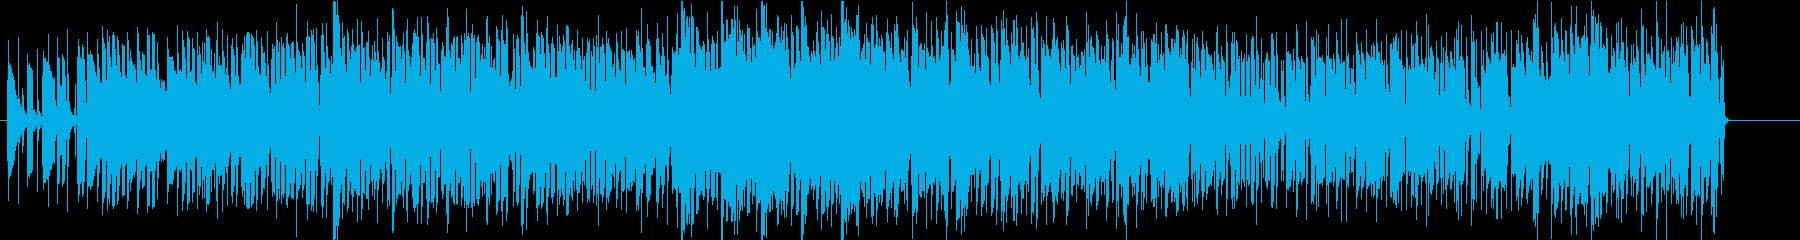 Bukarabuの再生済みの波形